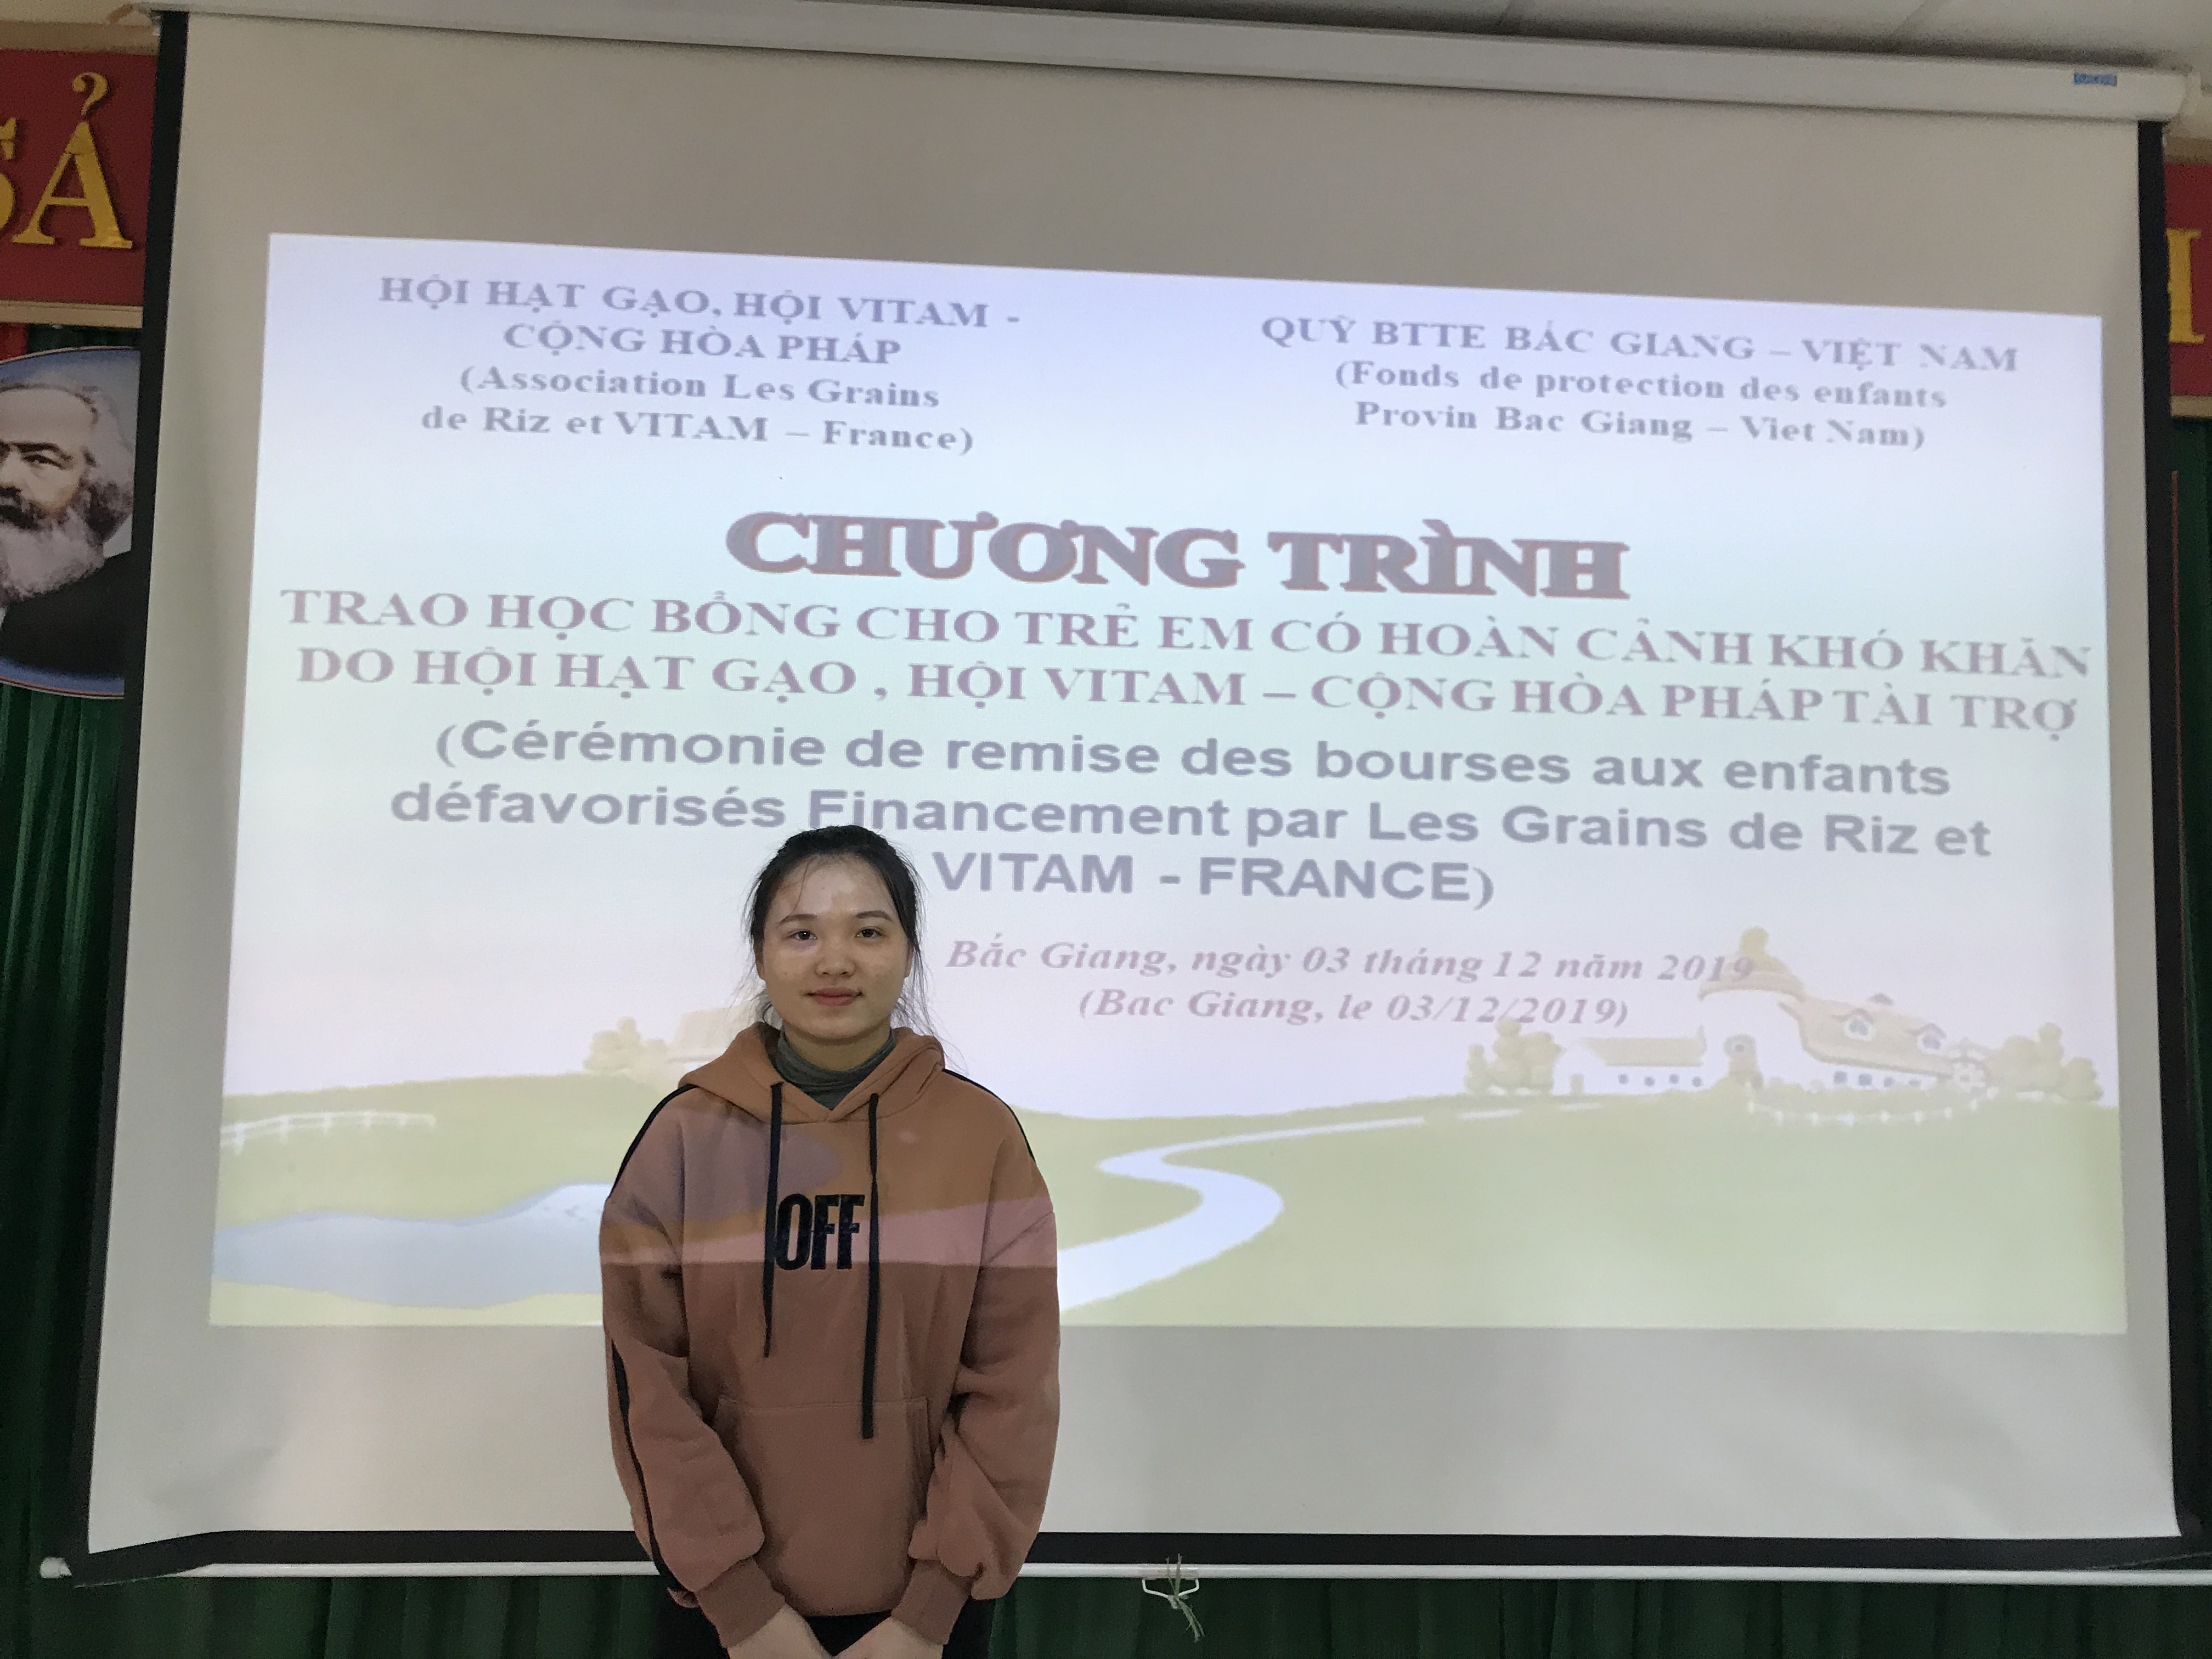 AVRIL-Jean-Baptiste_TANG-Thi-Tham